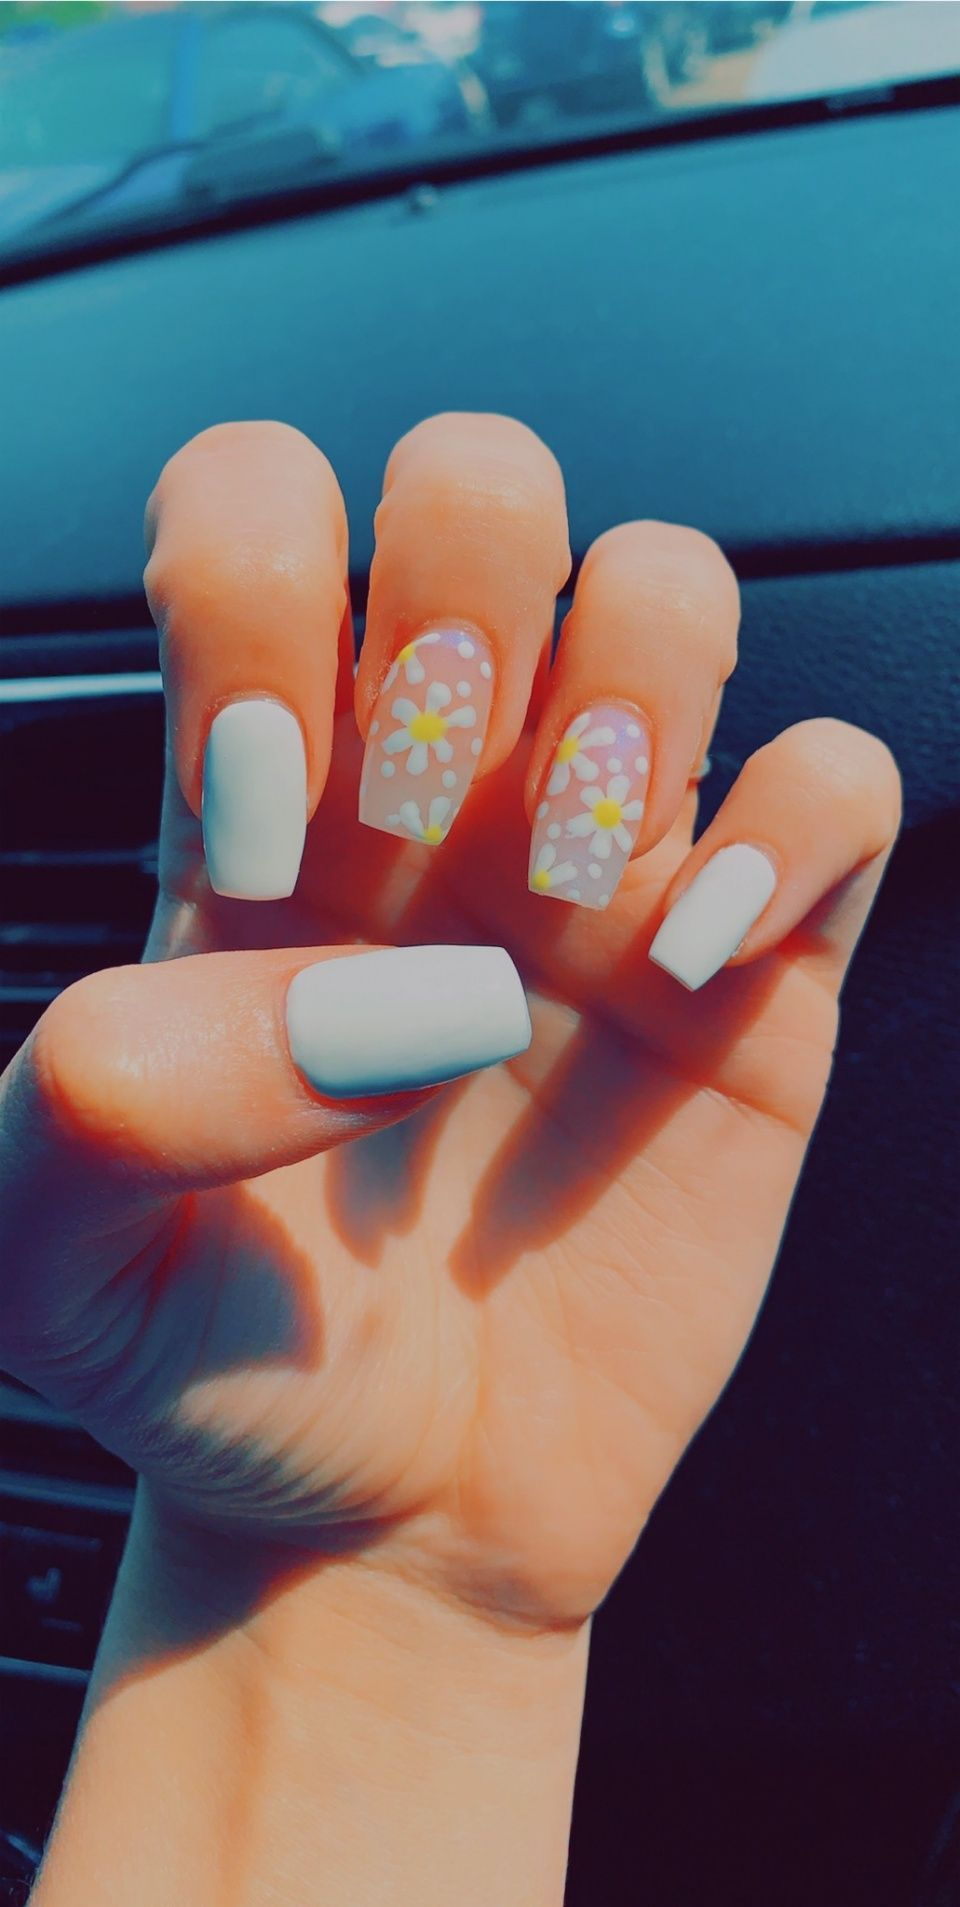 Photo of diva nails 6th and havana – Diva Nails #havana #Diva #DivaNails –